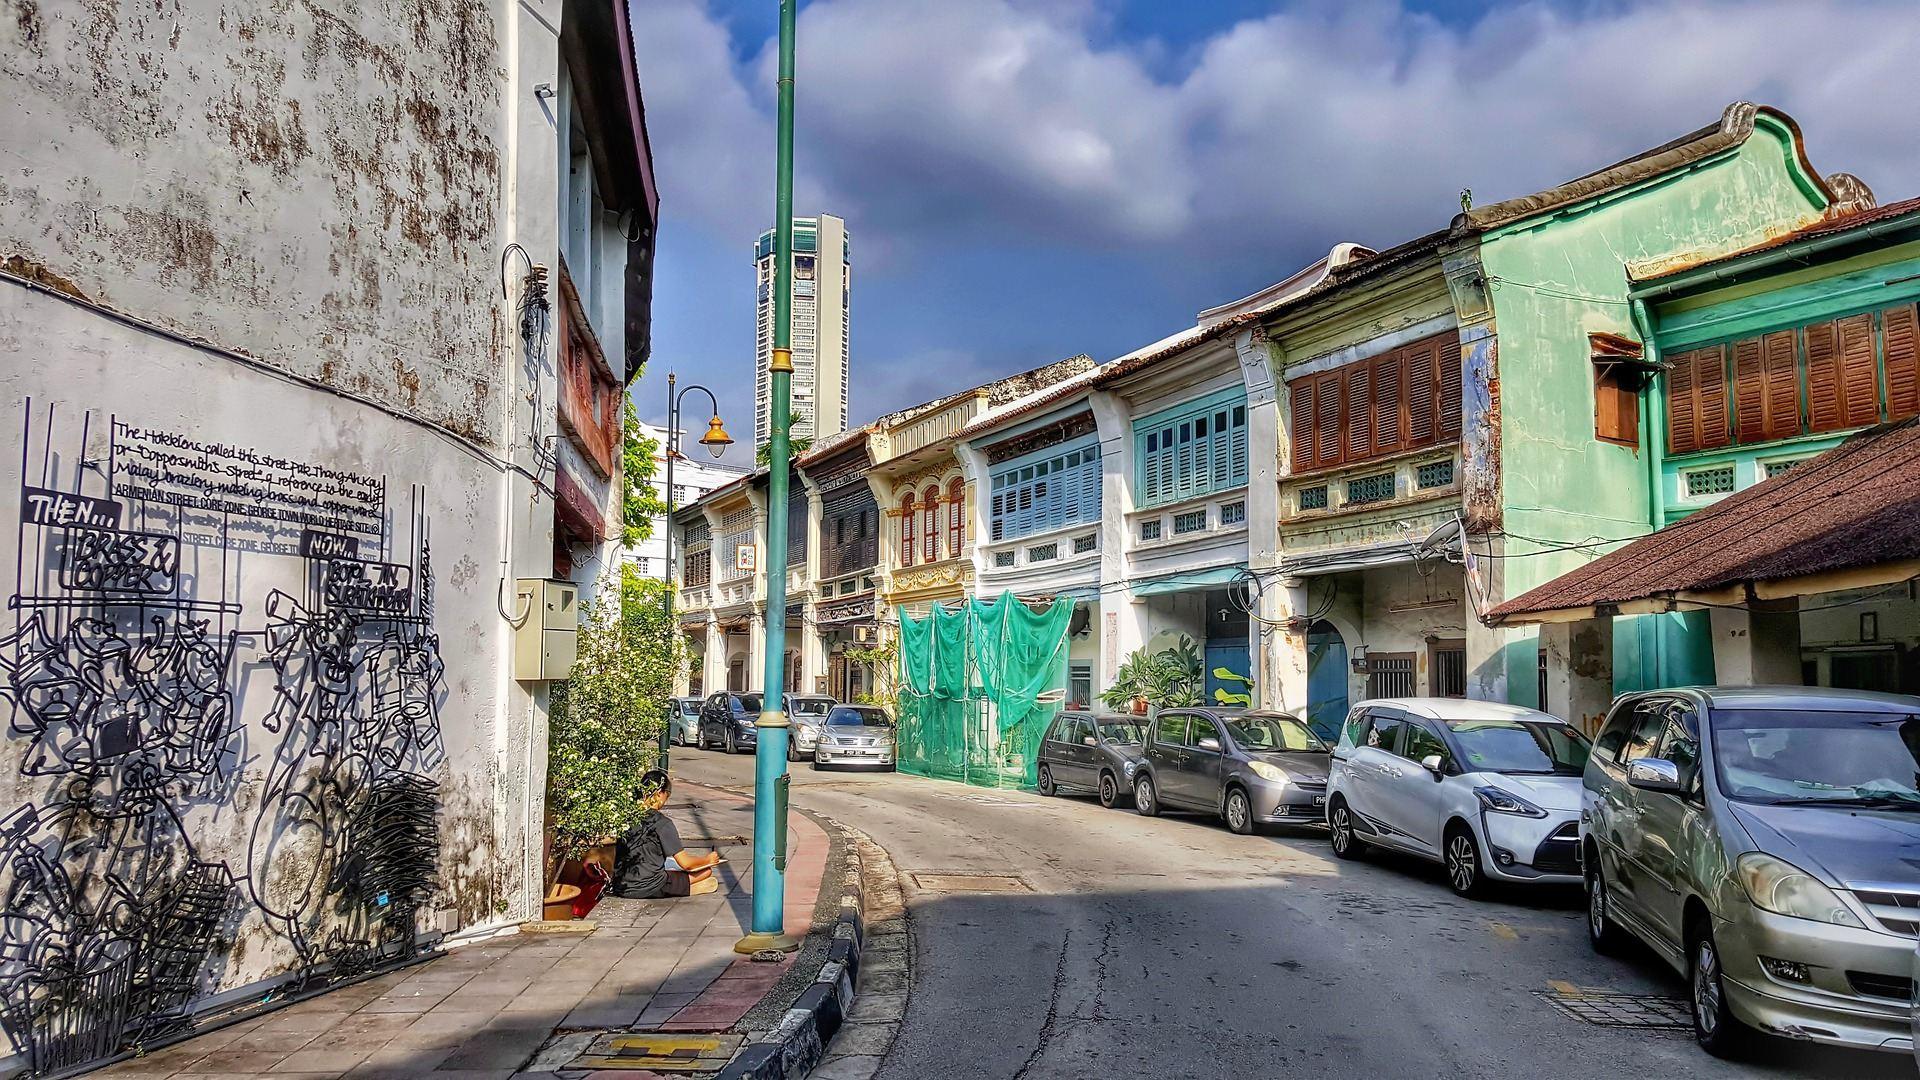 penang-street-view-2883947_1920-toj1gy